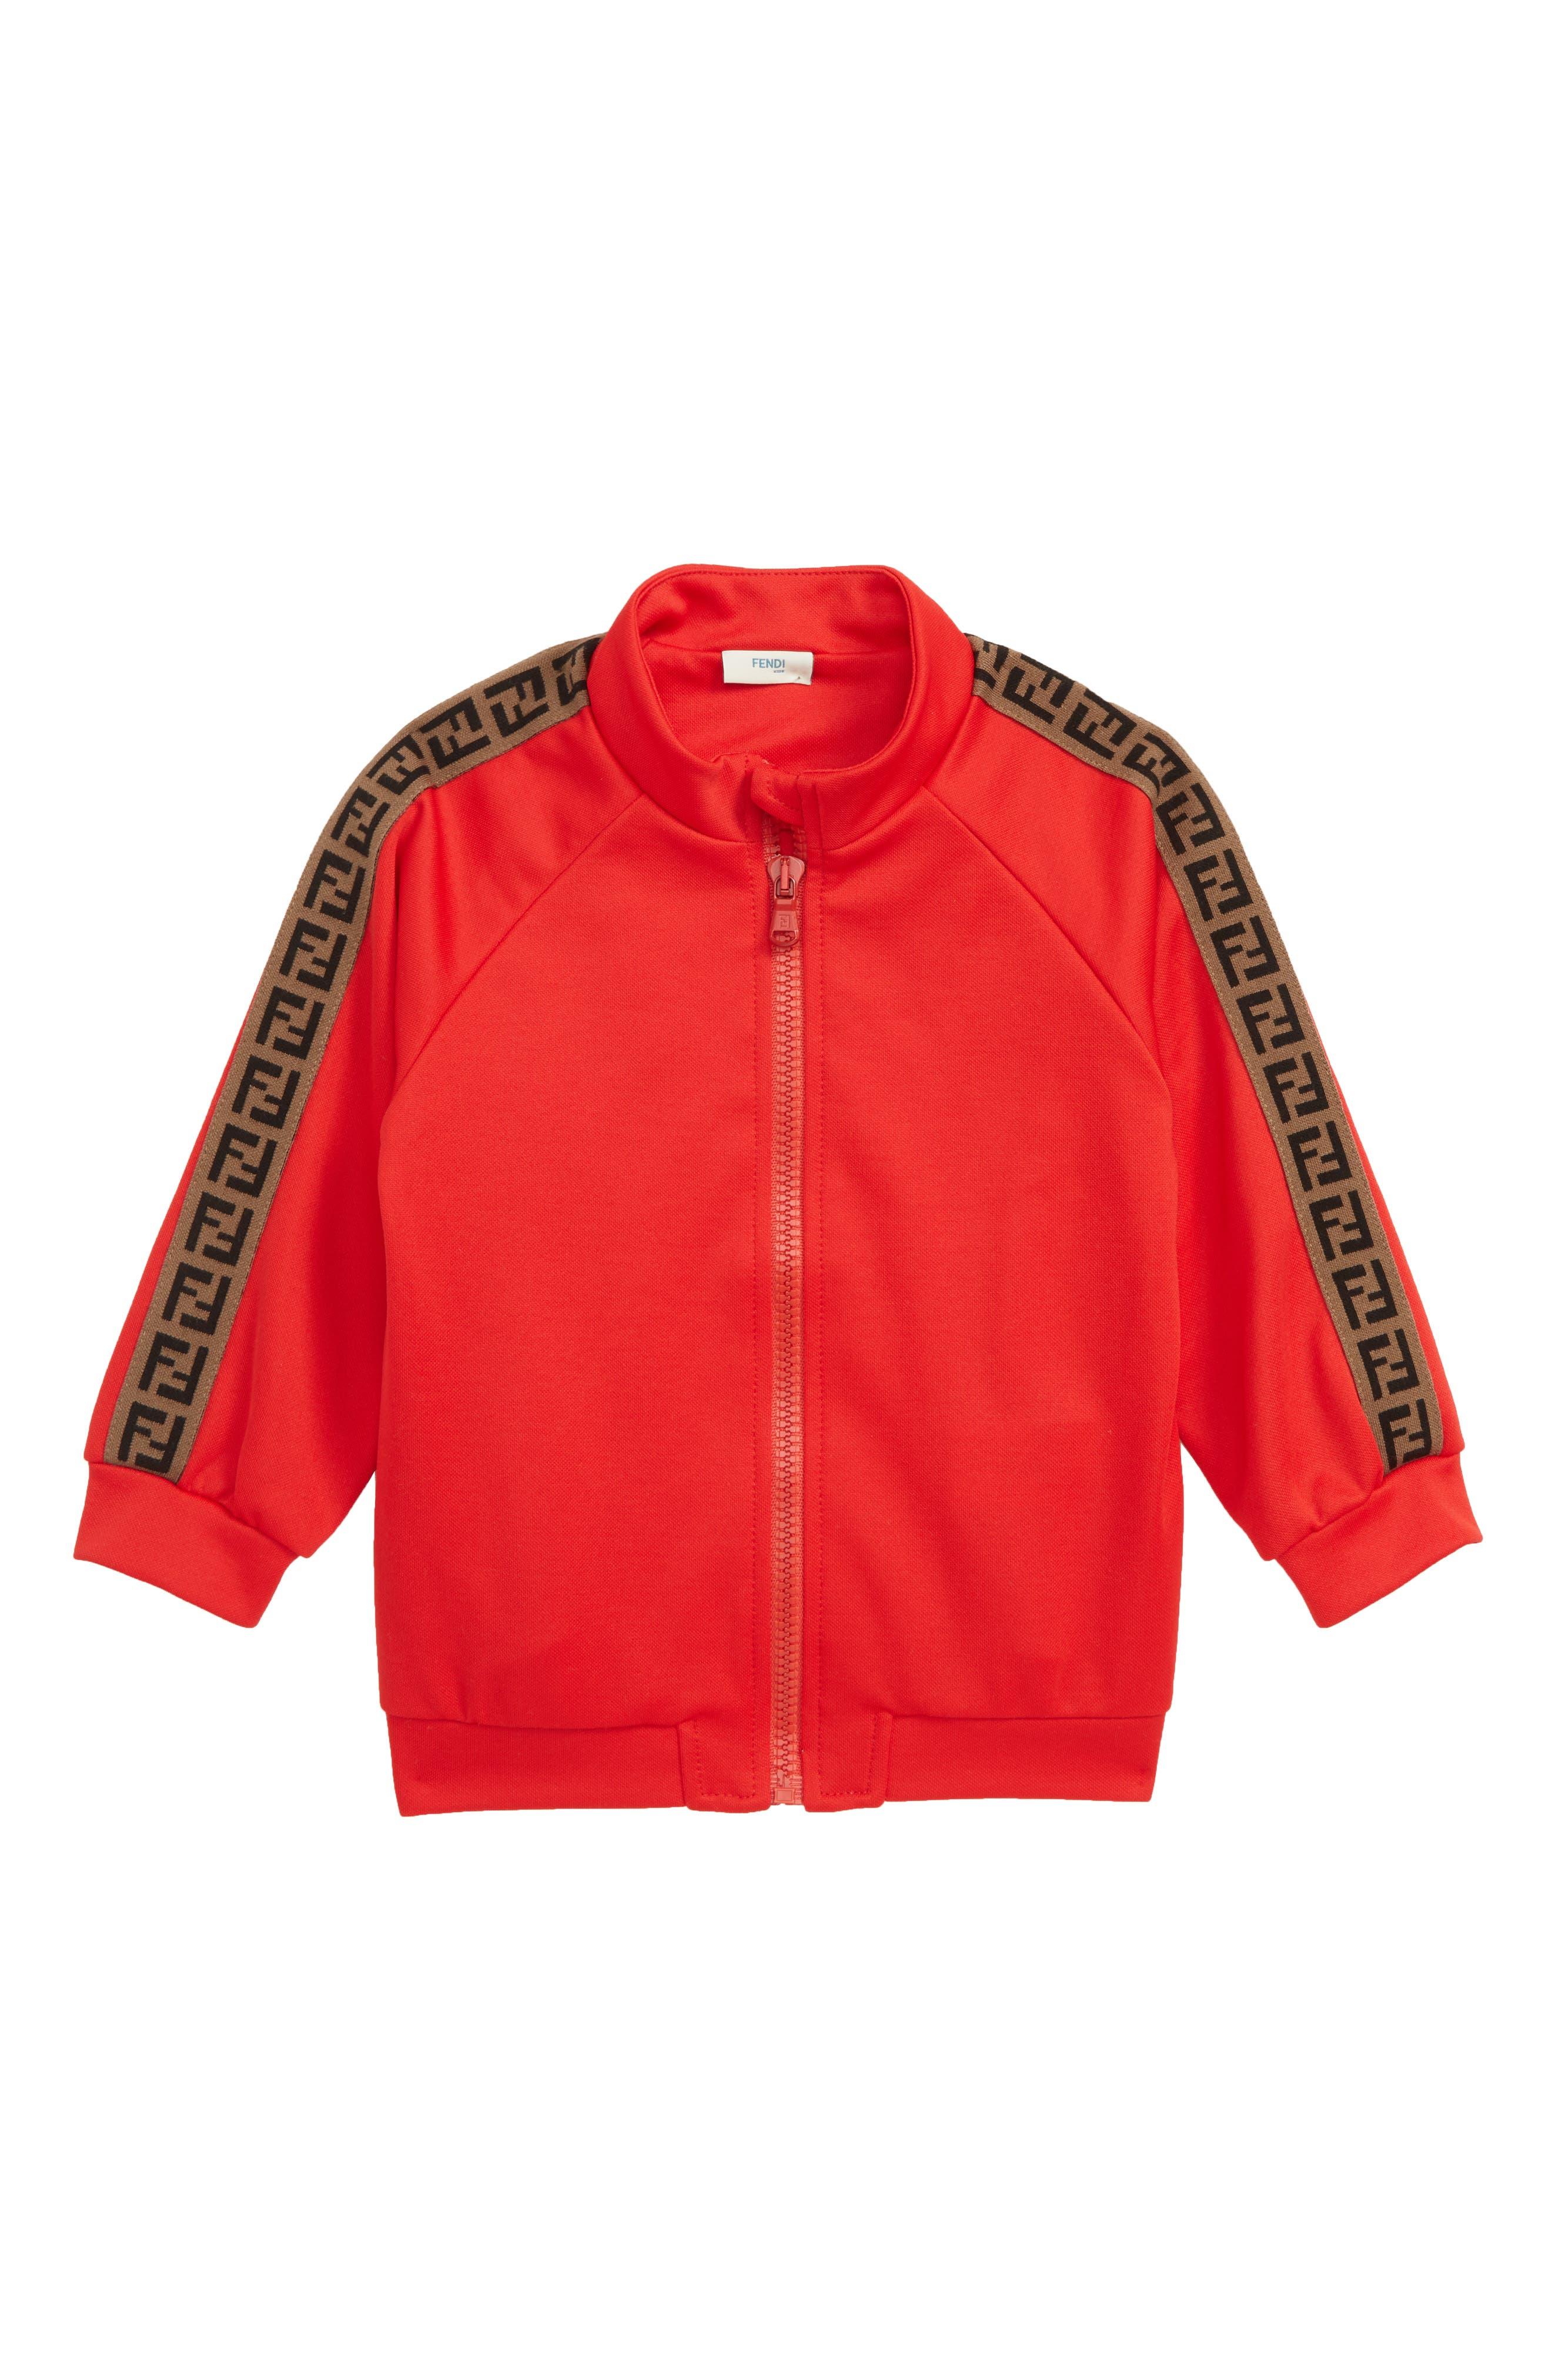 FENDI, Double-F Logo Track Jacket, Main thumbnail 1, color, F0QC9 RED